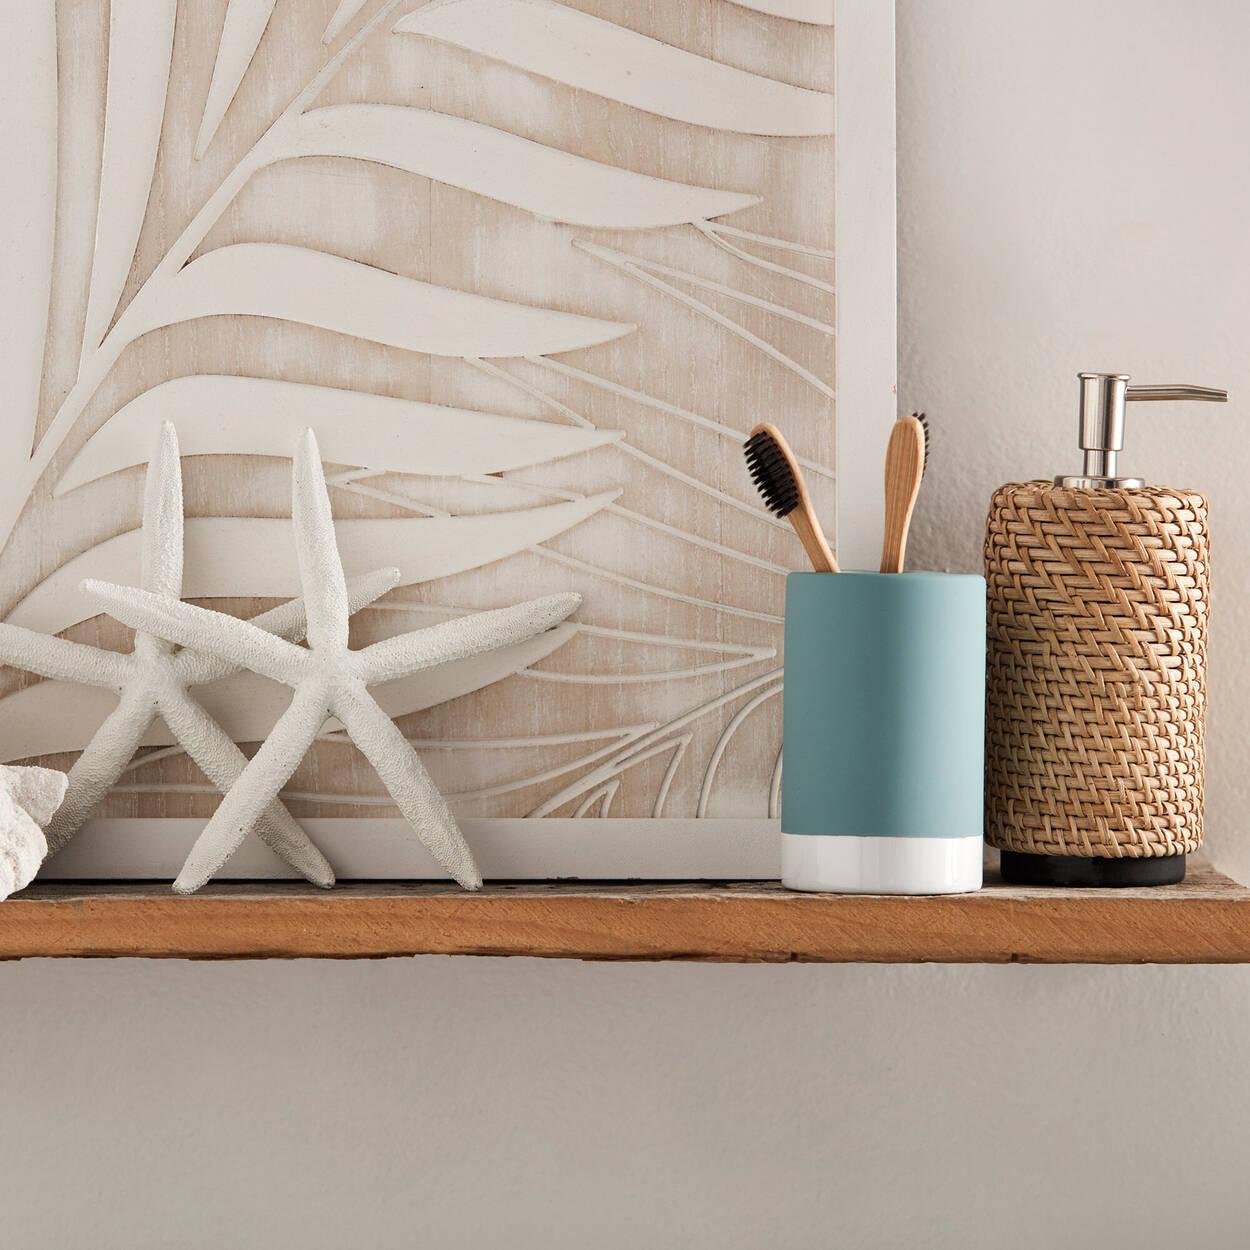 Set of 3 Decorative Resin Starfish